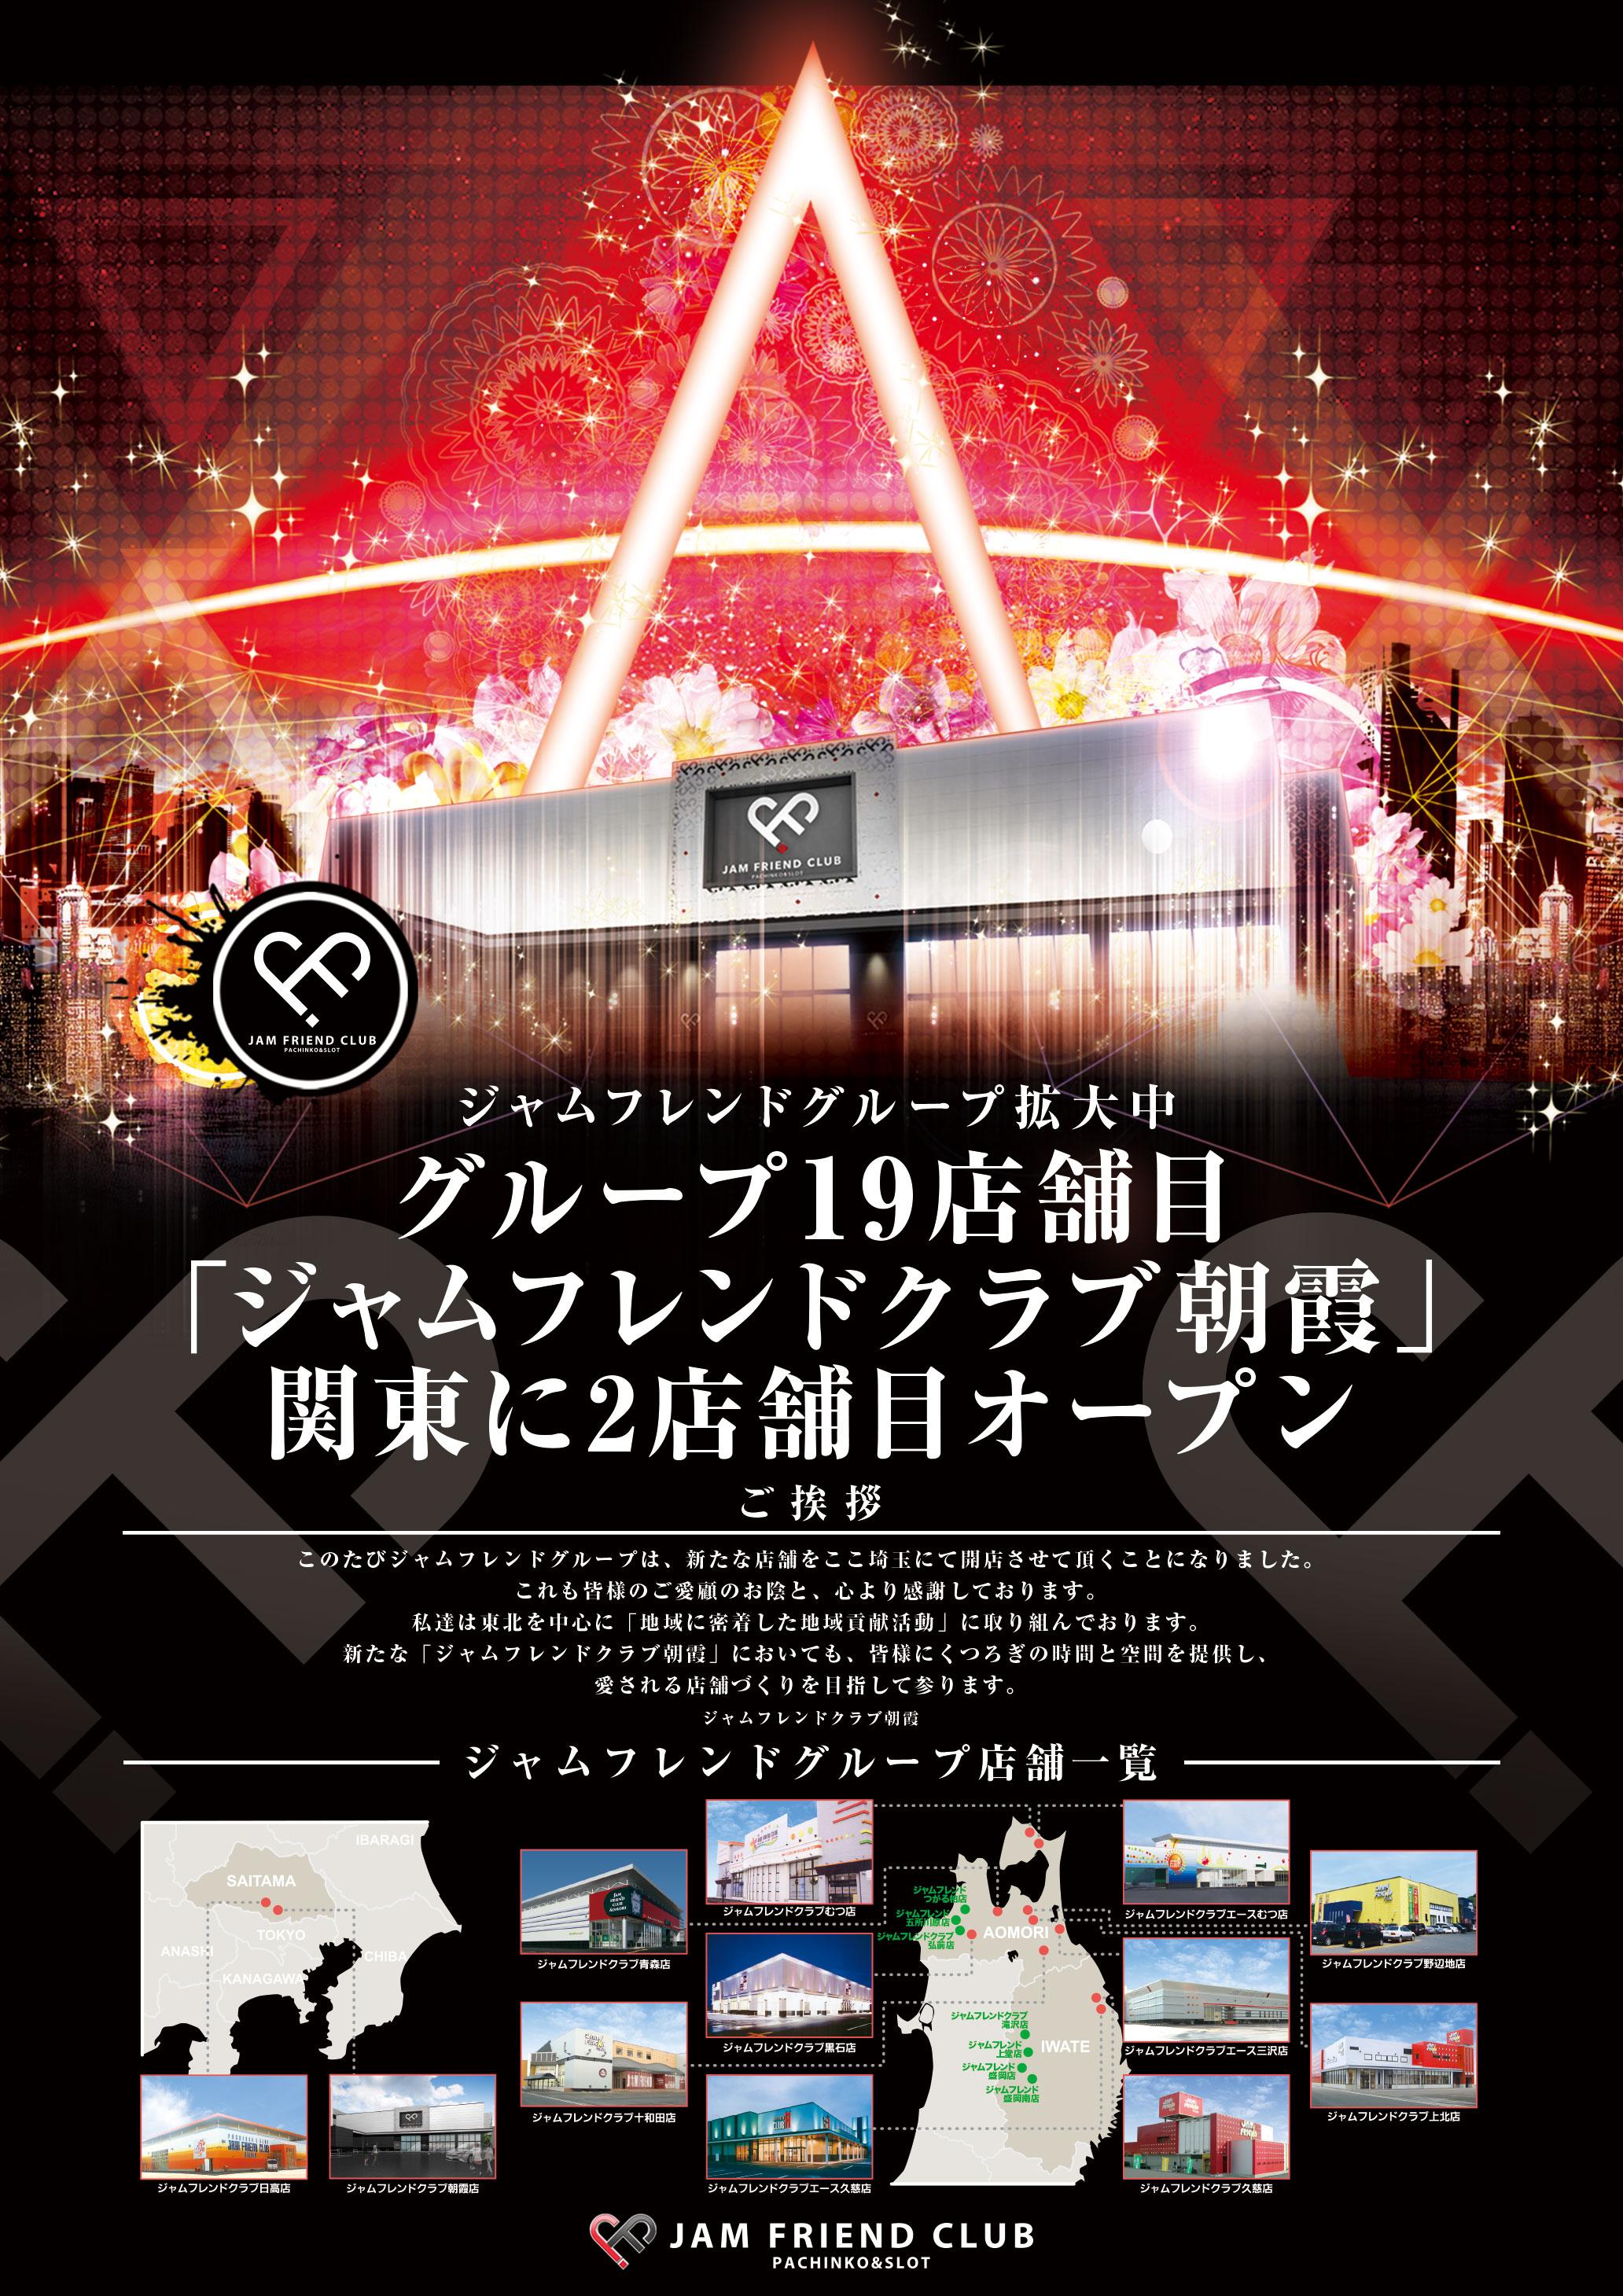 http://jam-fc.jp/information/images/%21cid_A0DBFEAB-B3C5-4D40-BD80-40FC10895325.jpg